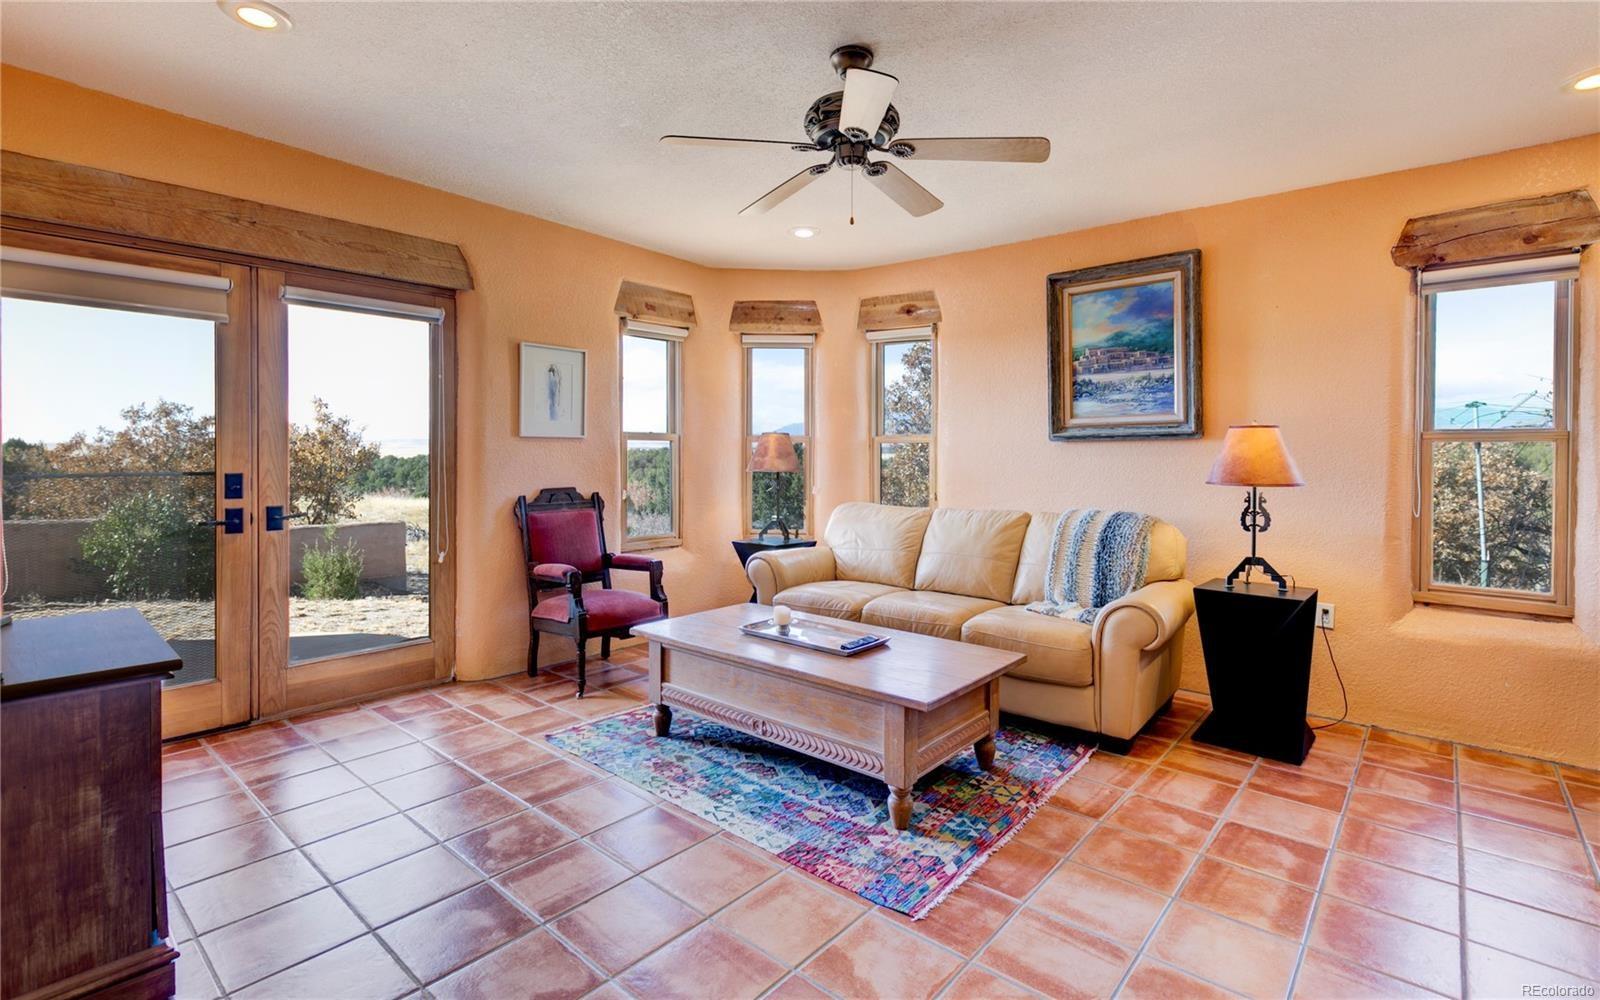 MLS# 3090448 - 19 - 7708 Sunset Ridge Drive, Pueblo, CO 81004